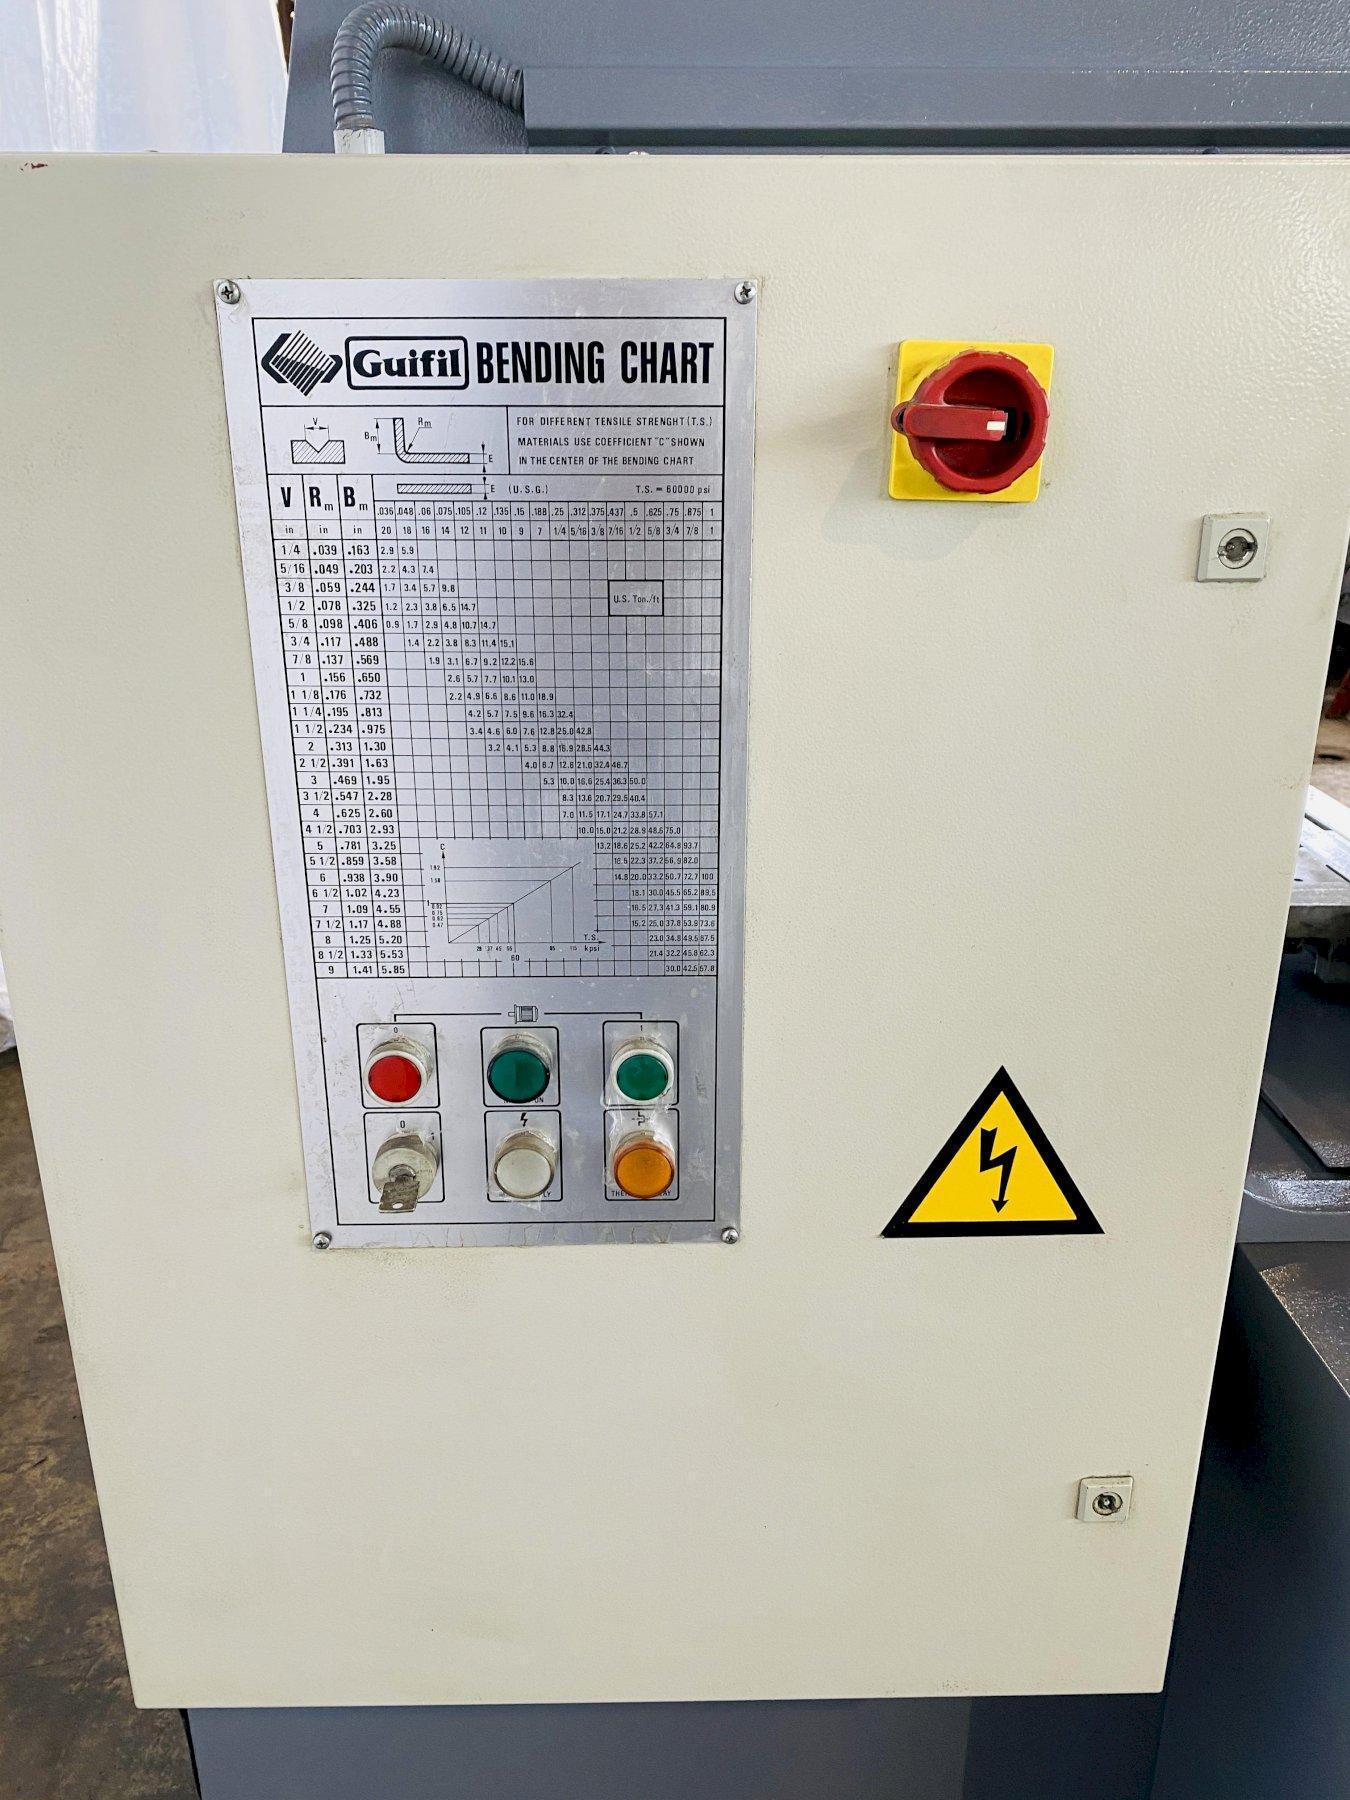 "66 TON X 80"" GUIFIL PE-20/60 CNC HYDRAULIC UP ACTING PRESS BRAKE. STOCK # 0847320"